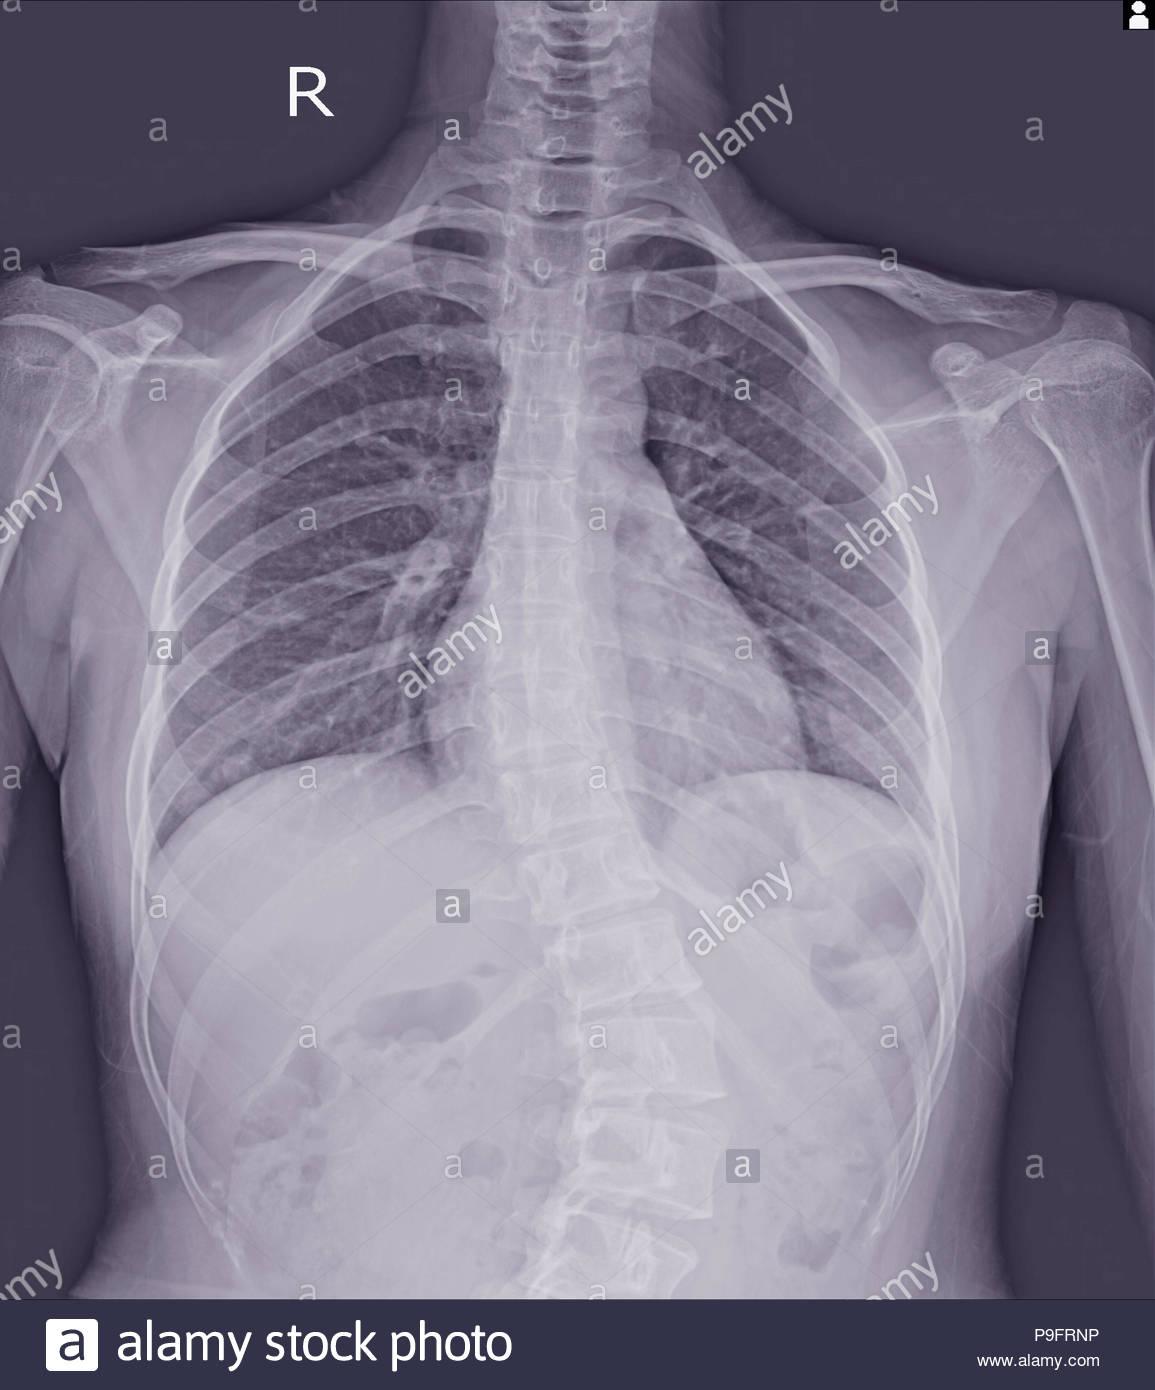 La scoliose film x-ray afficher la courbure de la colonne ...